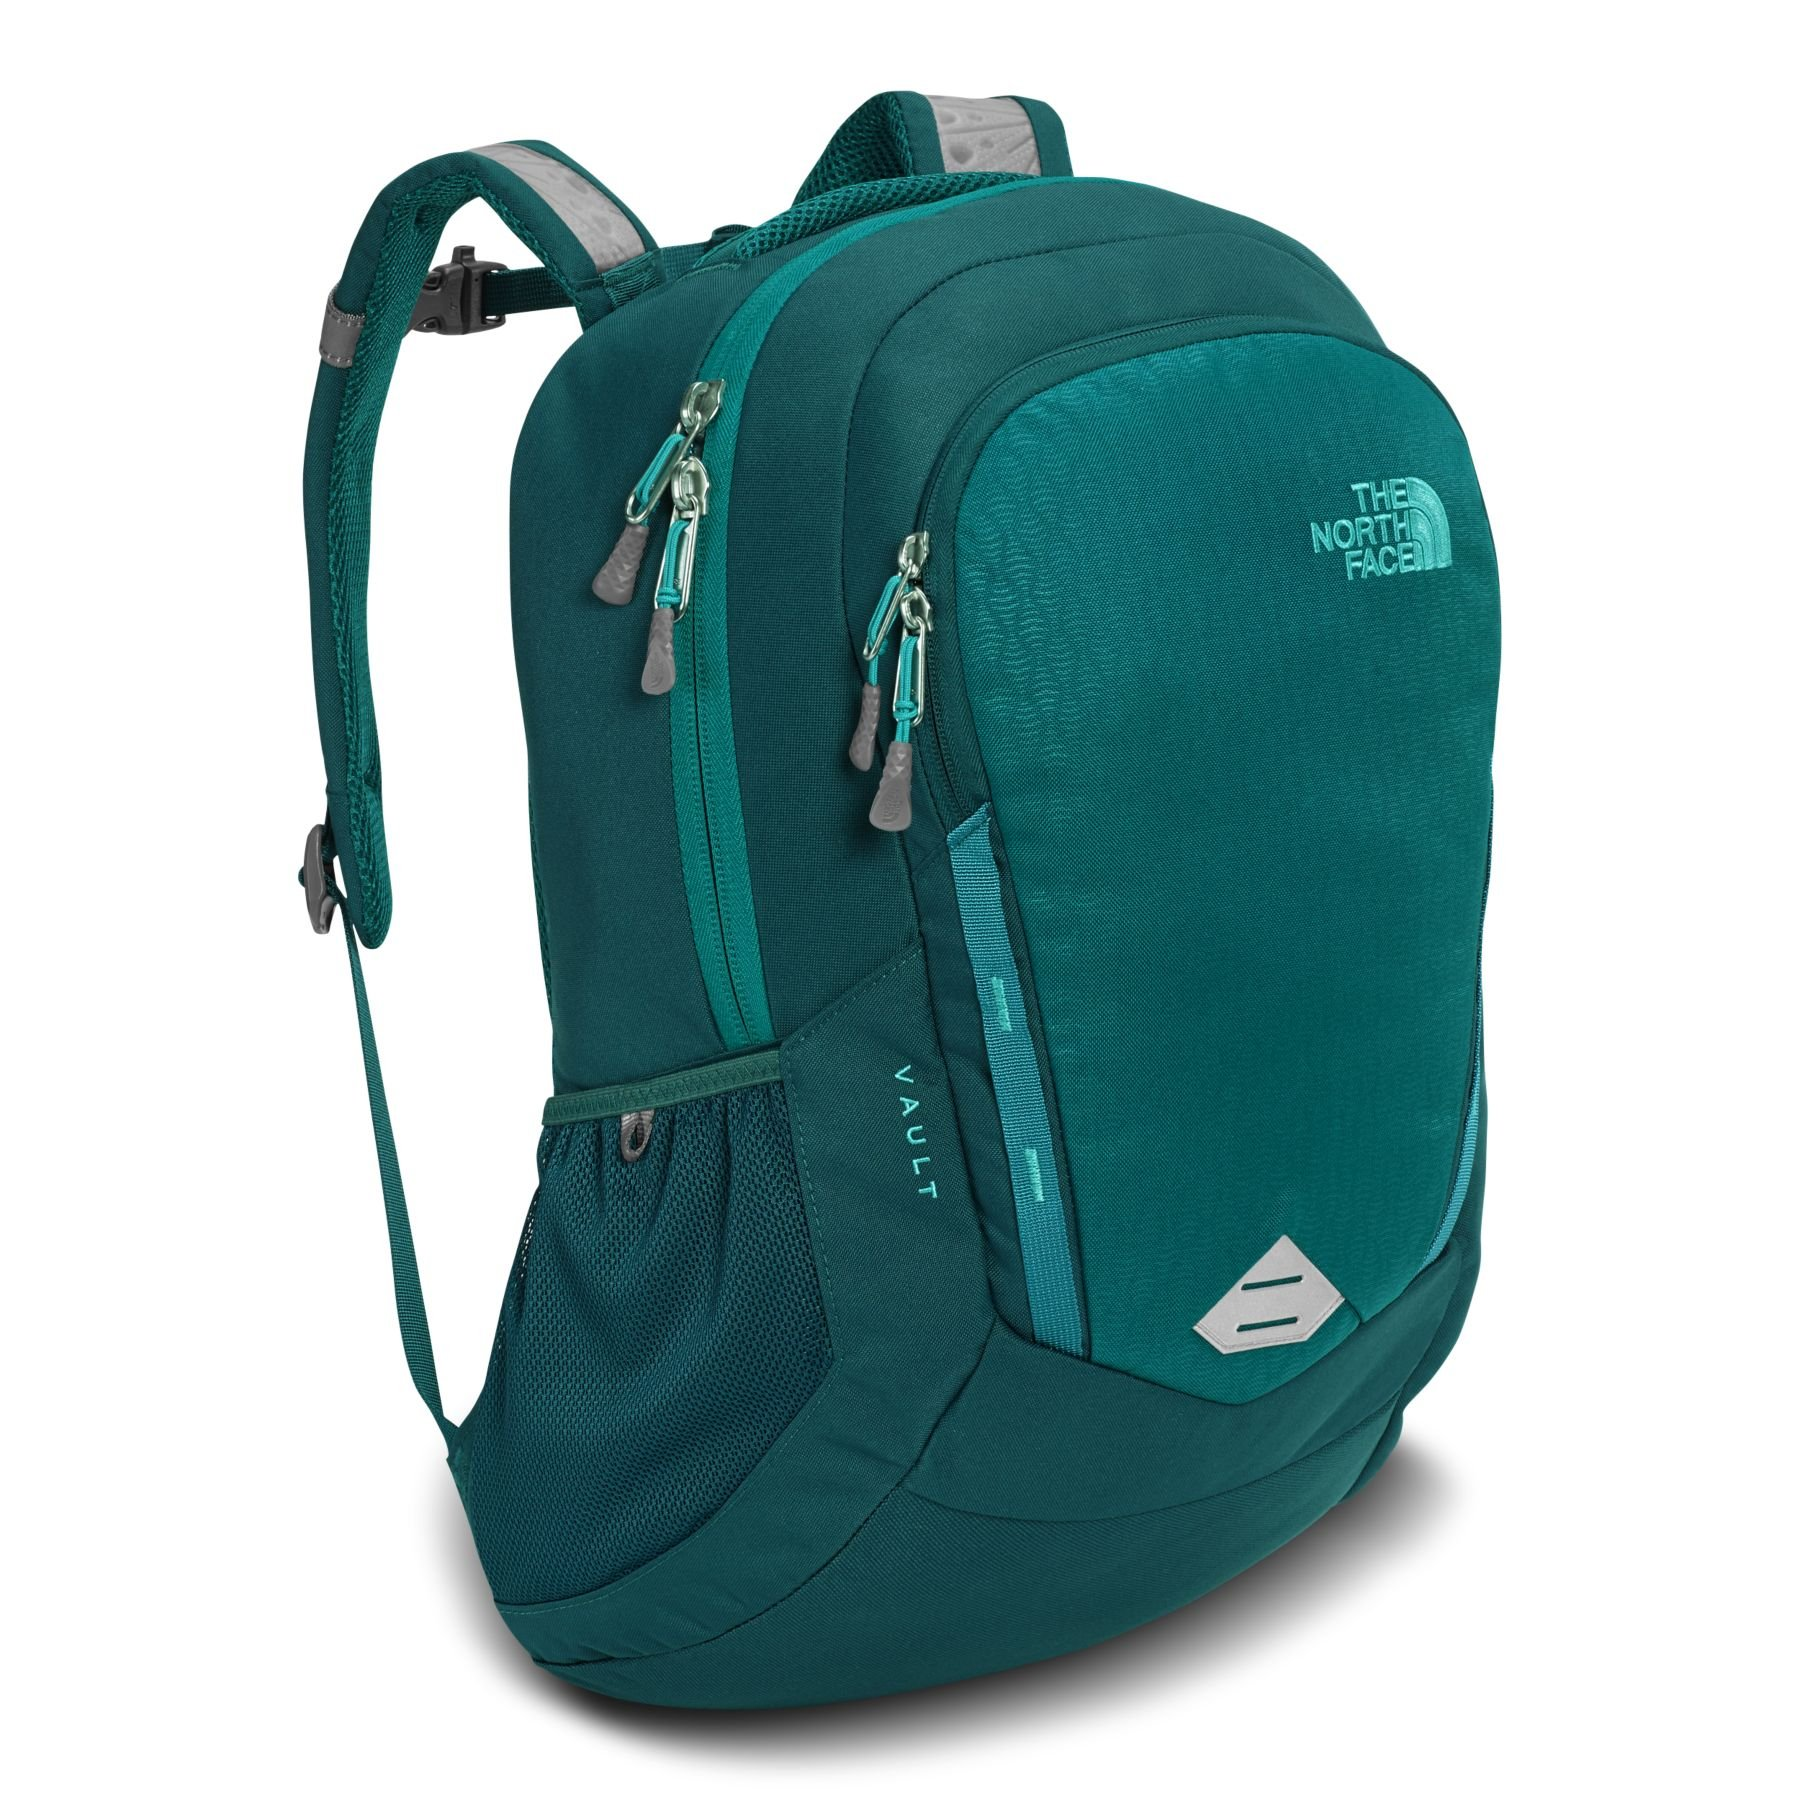 51f0ddc21 The North Face Women's Vault Backpack - Harbor Blue Emboss & Atlantic Deep  Blue - OS (Past Season)